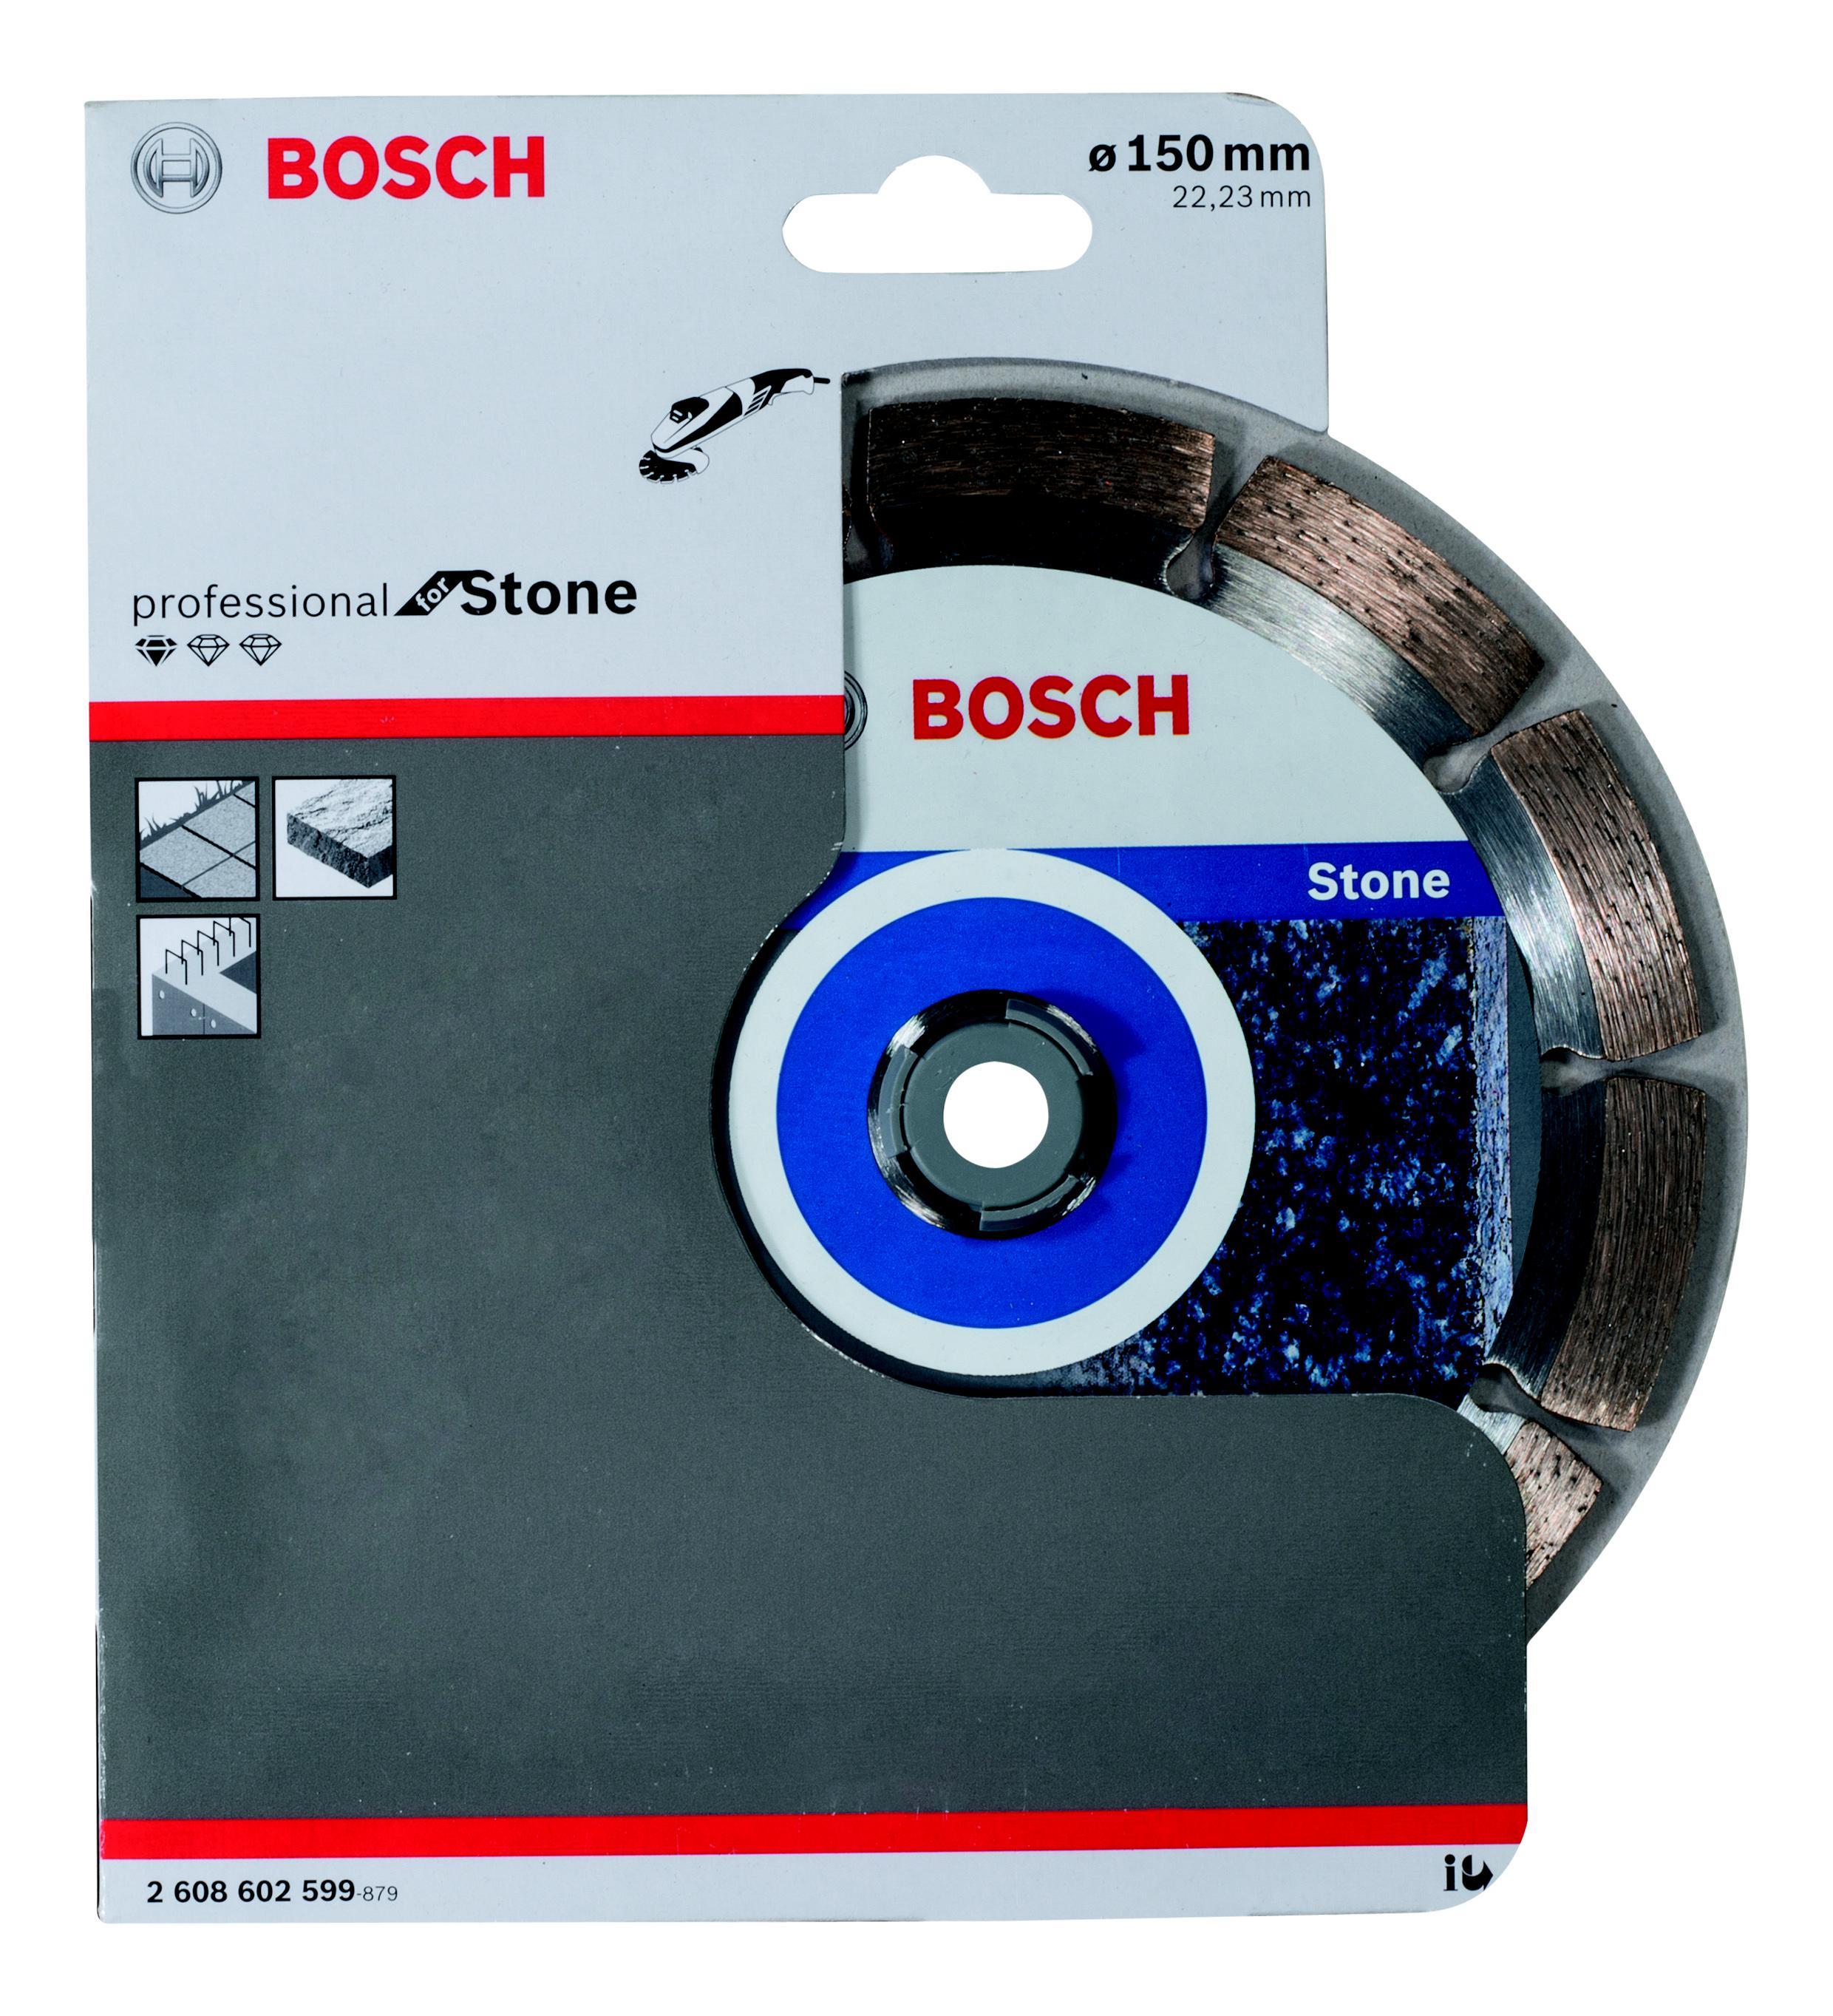 Круг алмазный Bosch Standard for stone 150x22 сегмент (2.608.602.599) sc32 150 airtac type standard air cylinder 32mm bore 150mm stroke sc32 150 single rod double action pneumatic cylinder sc 32 150